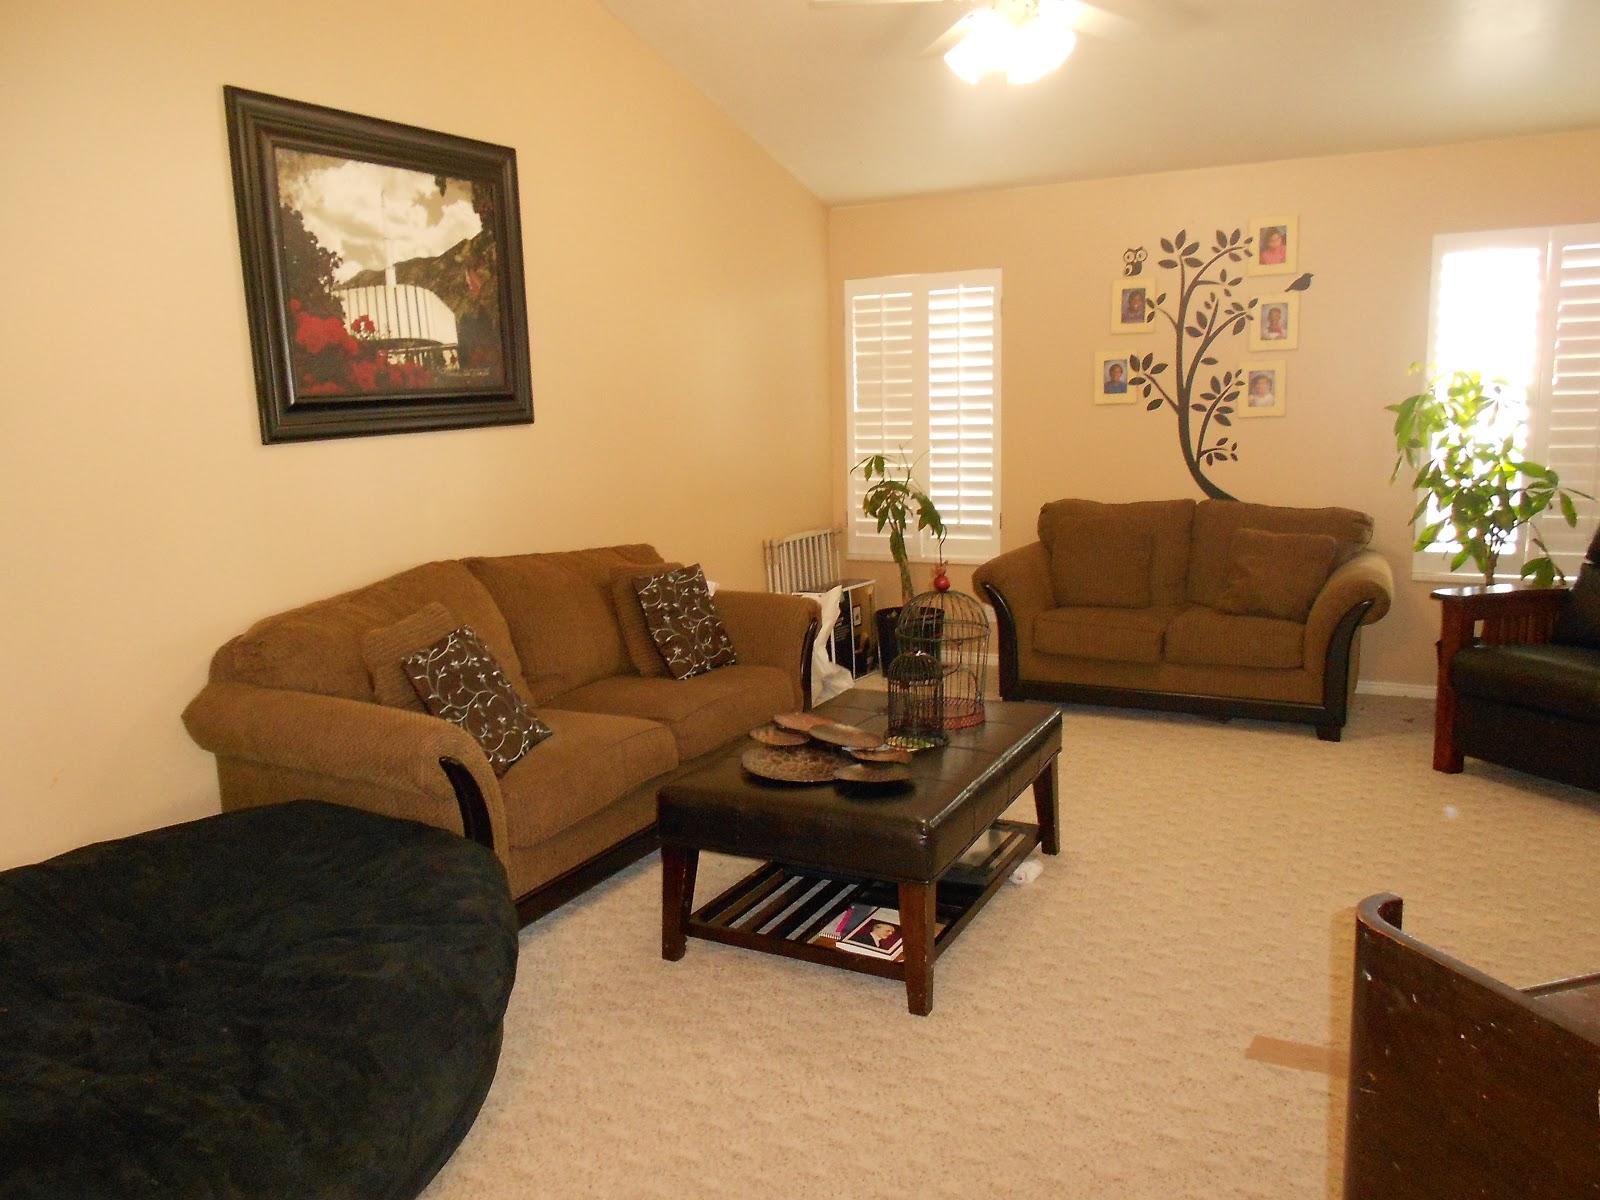 ImagineCozy: How To Make A Big Room Feel Cozy